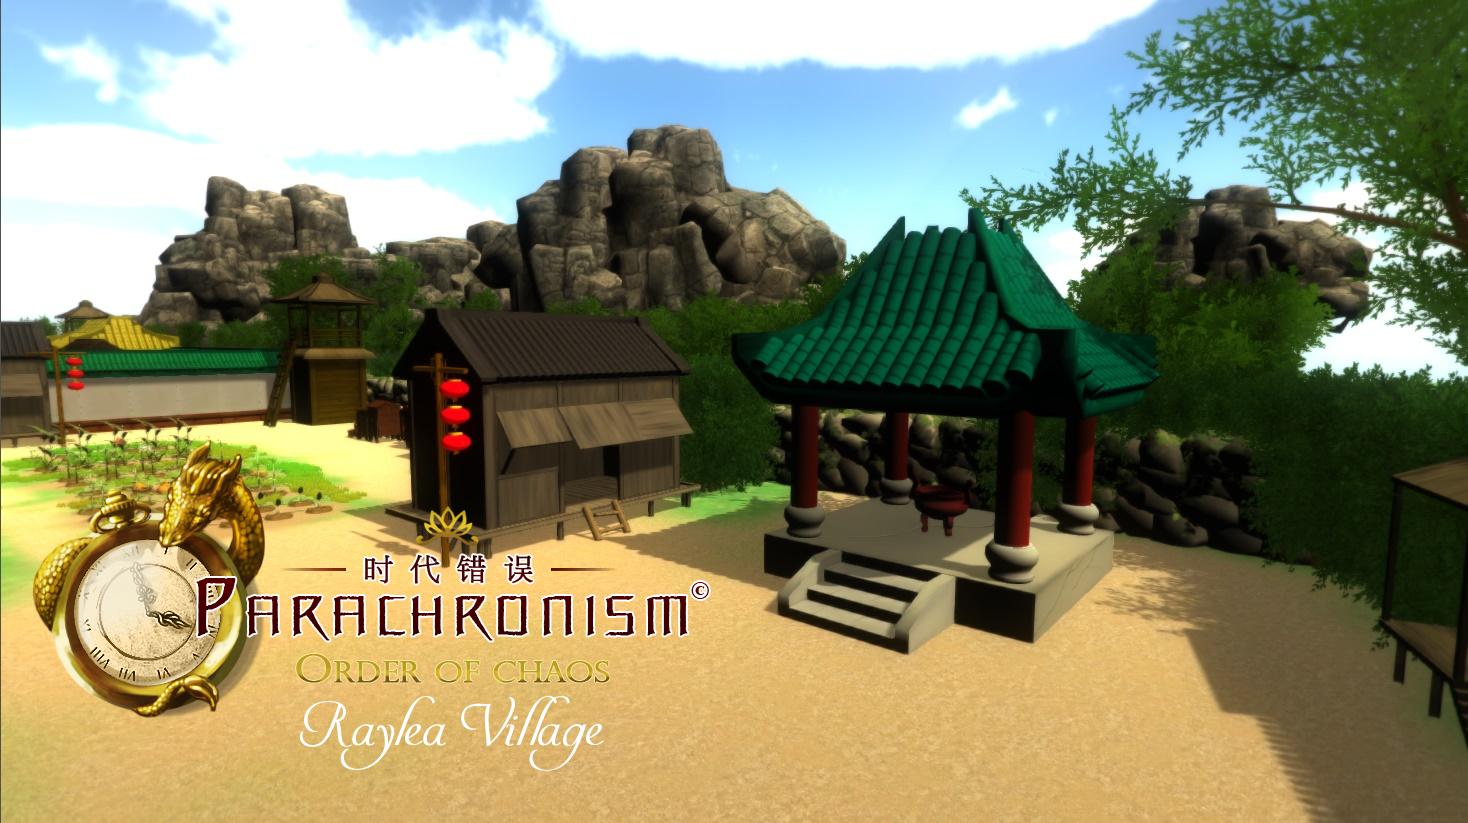 Raylea Village Poster 3